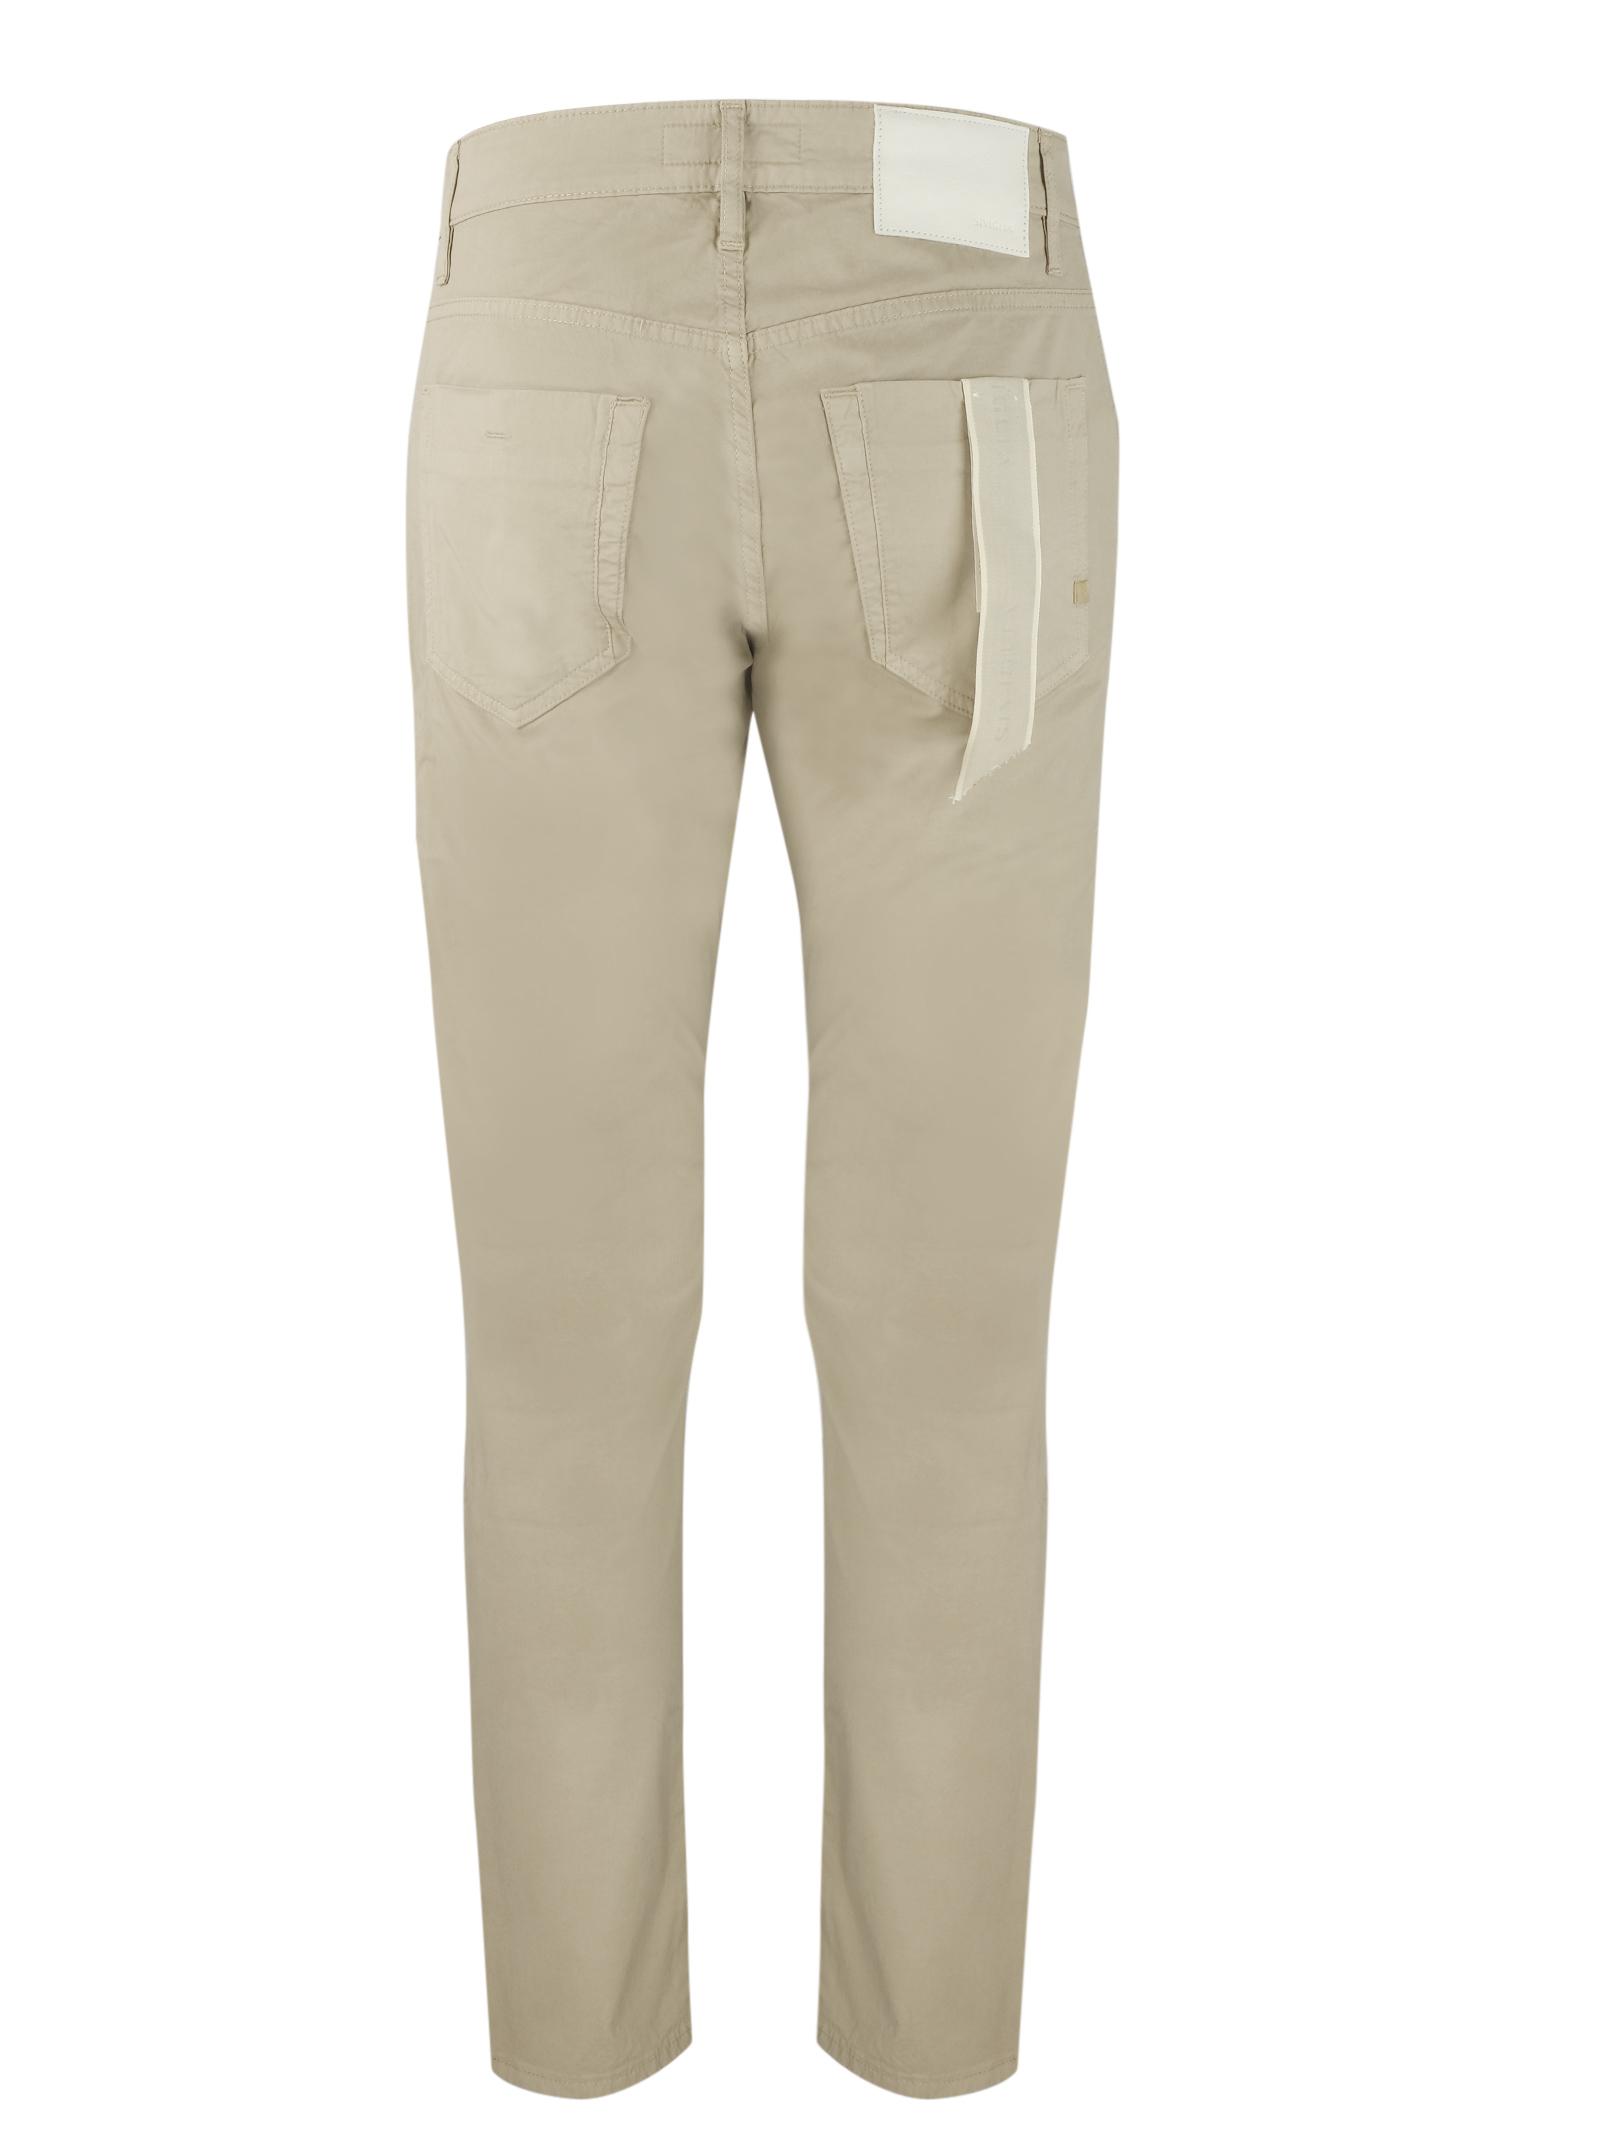 5 pocket light cotton pants SIVIGLIA | Trousers | MQ2002 80230805